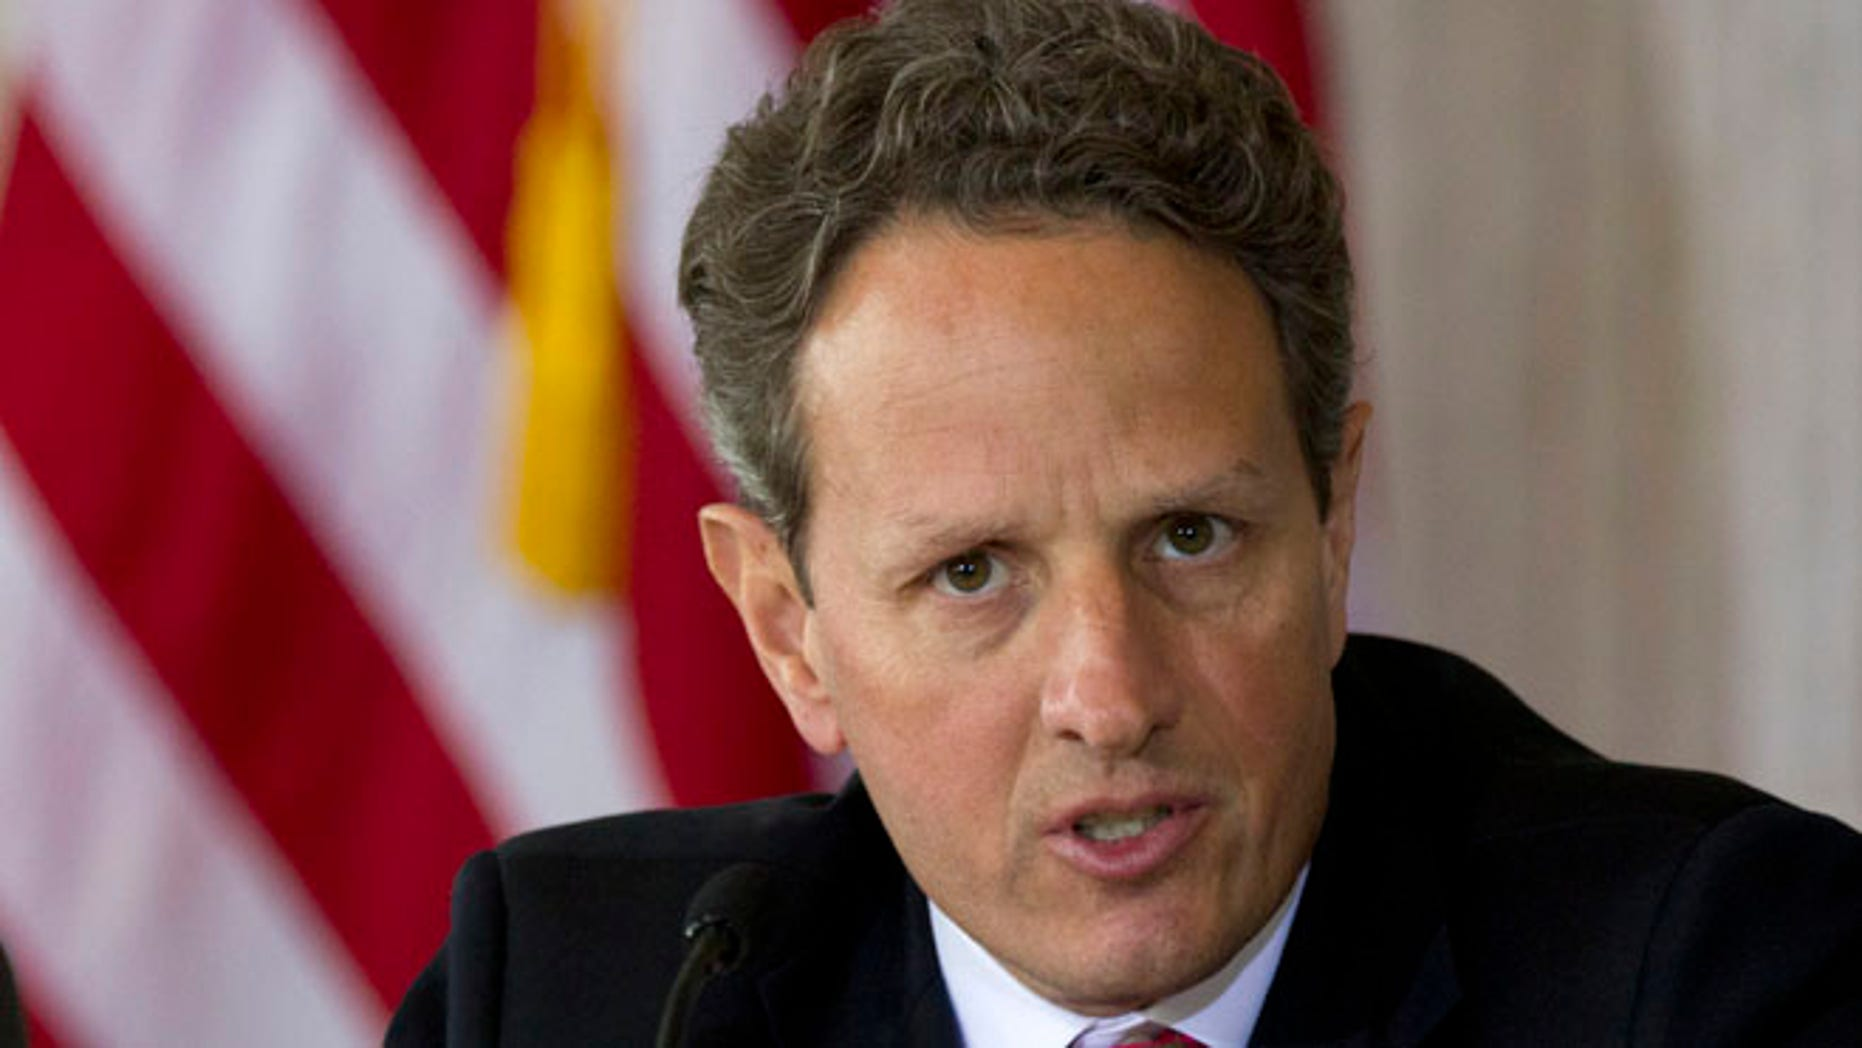 April 3, 2012: Treasury Secretary Timothy Geithner speaks at the Treasury Department in Washington.